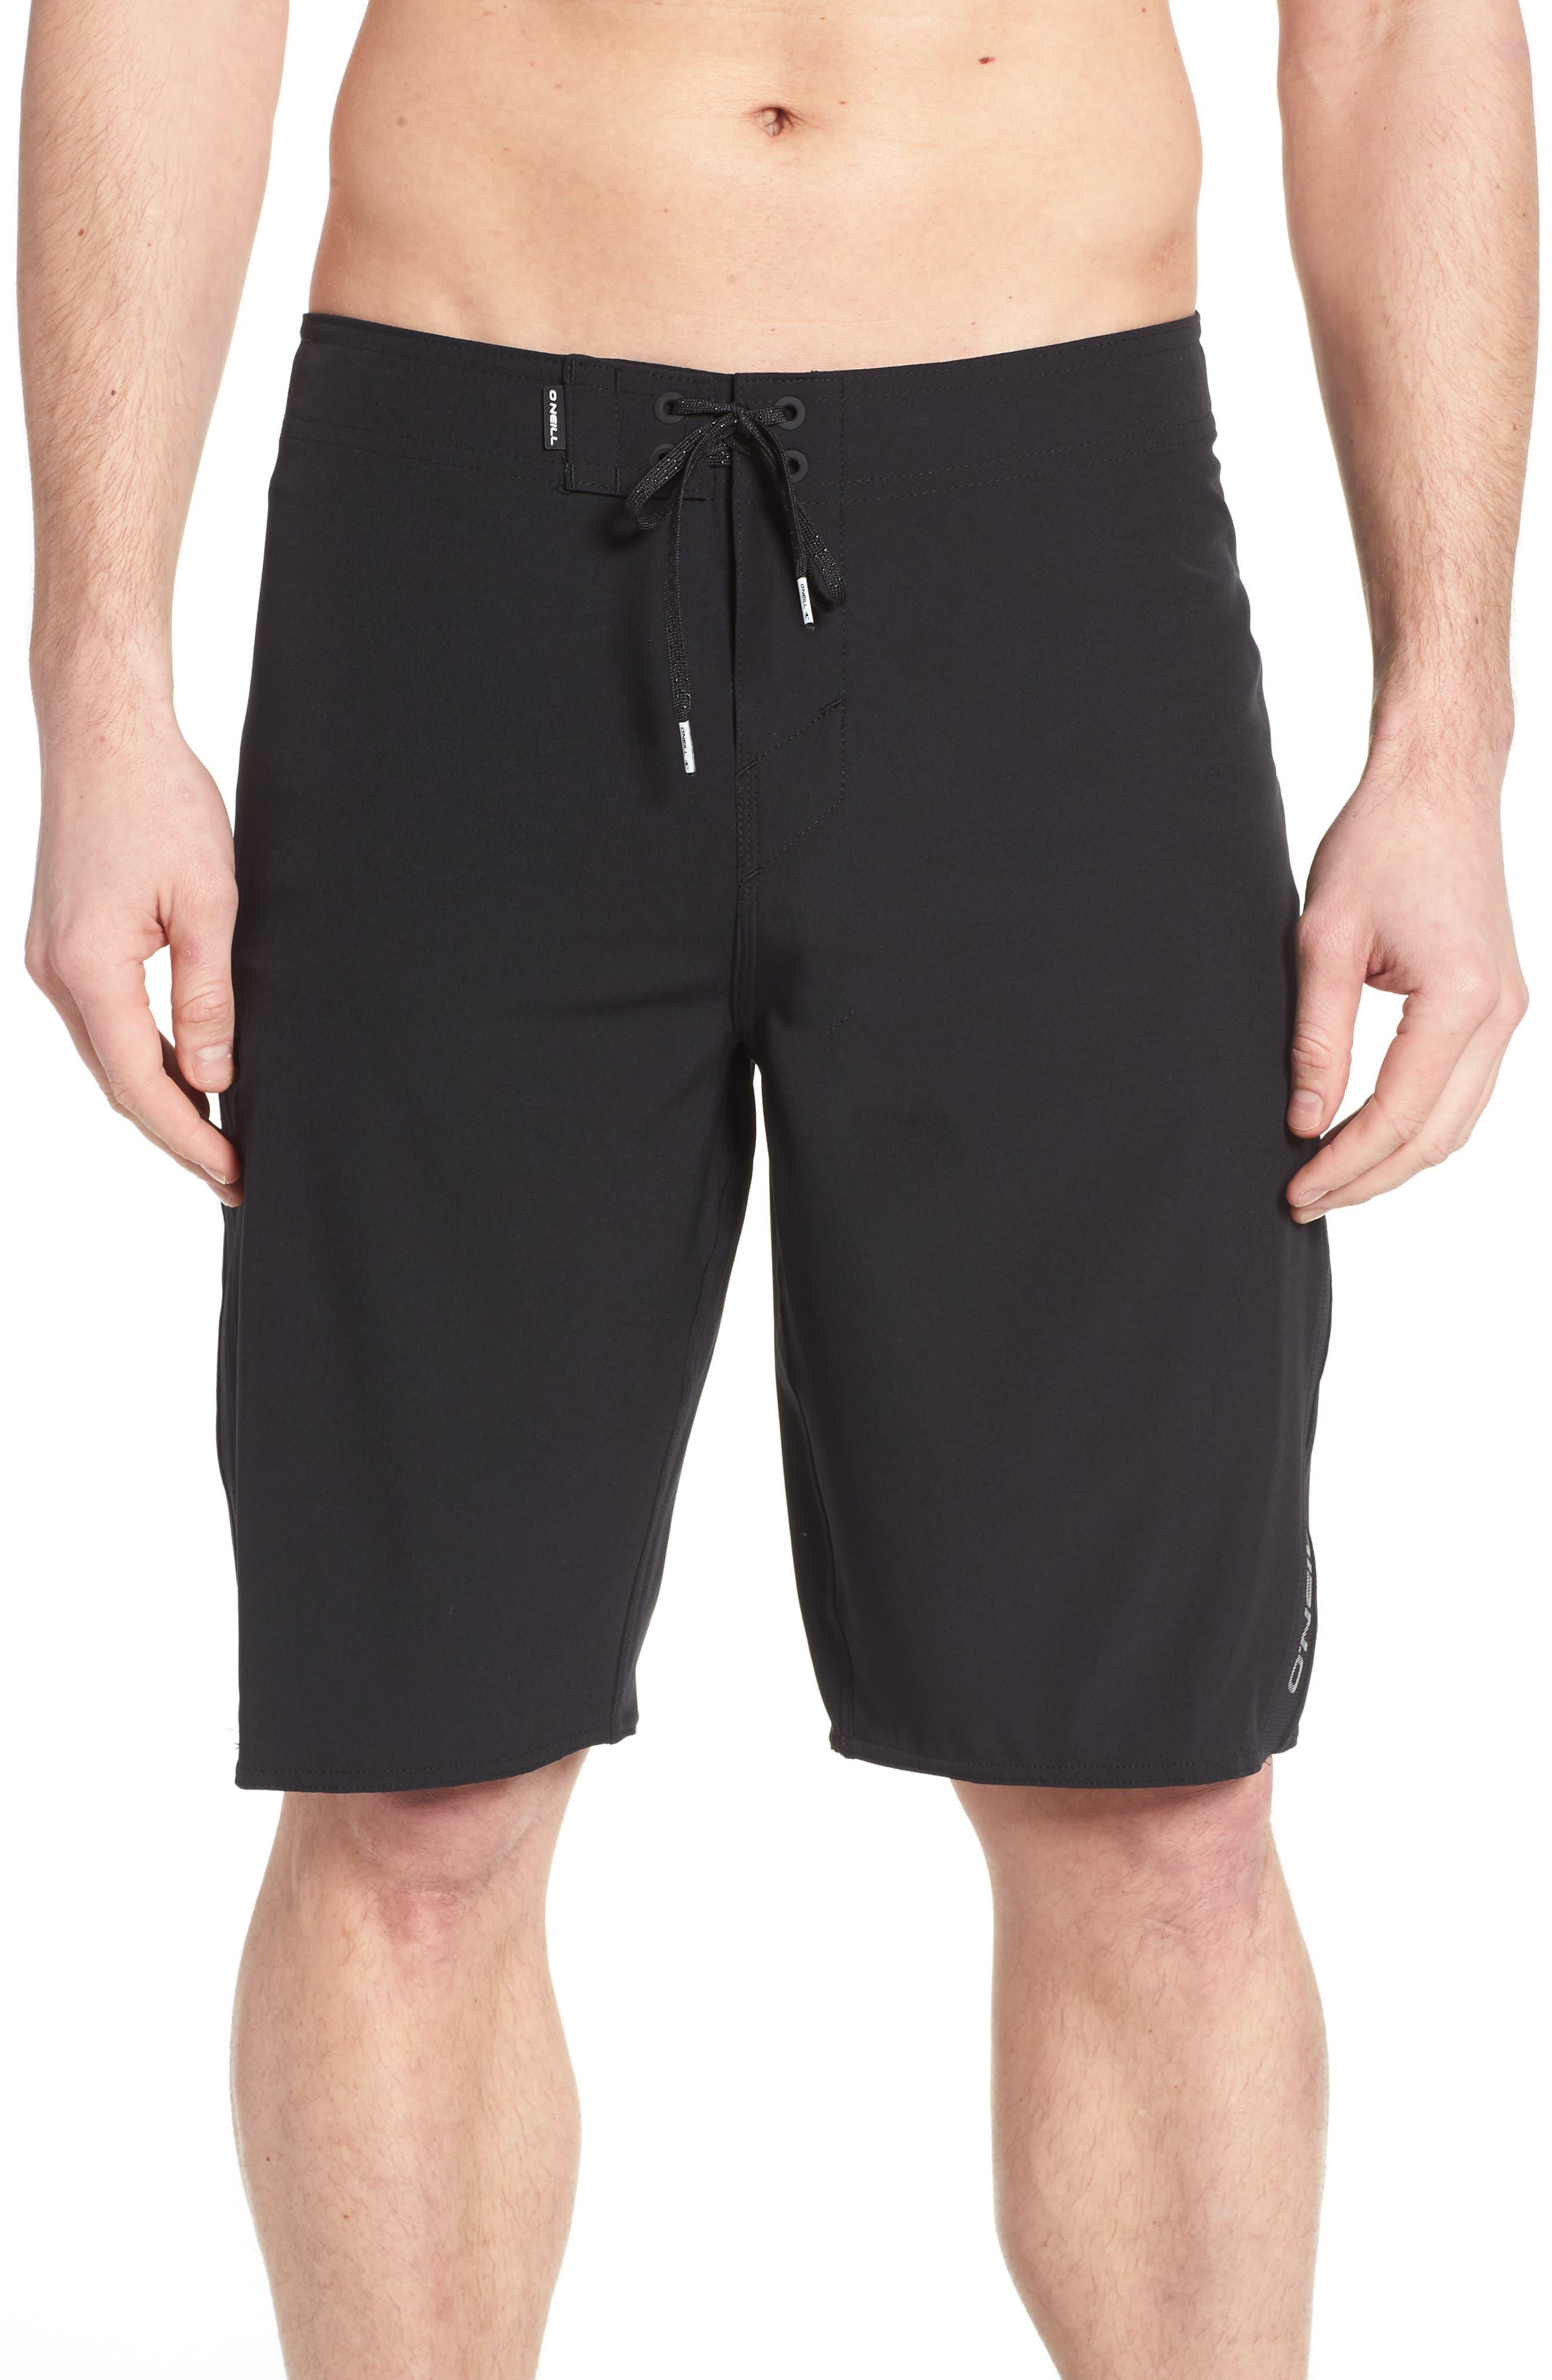 Superfreak Board Shorts,                         Main,                         color, 001